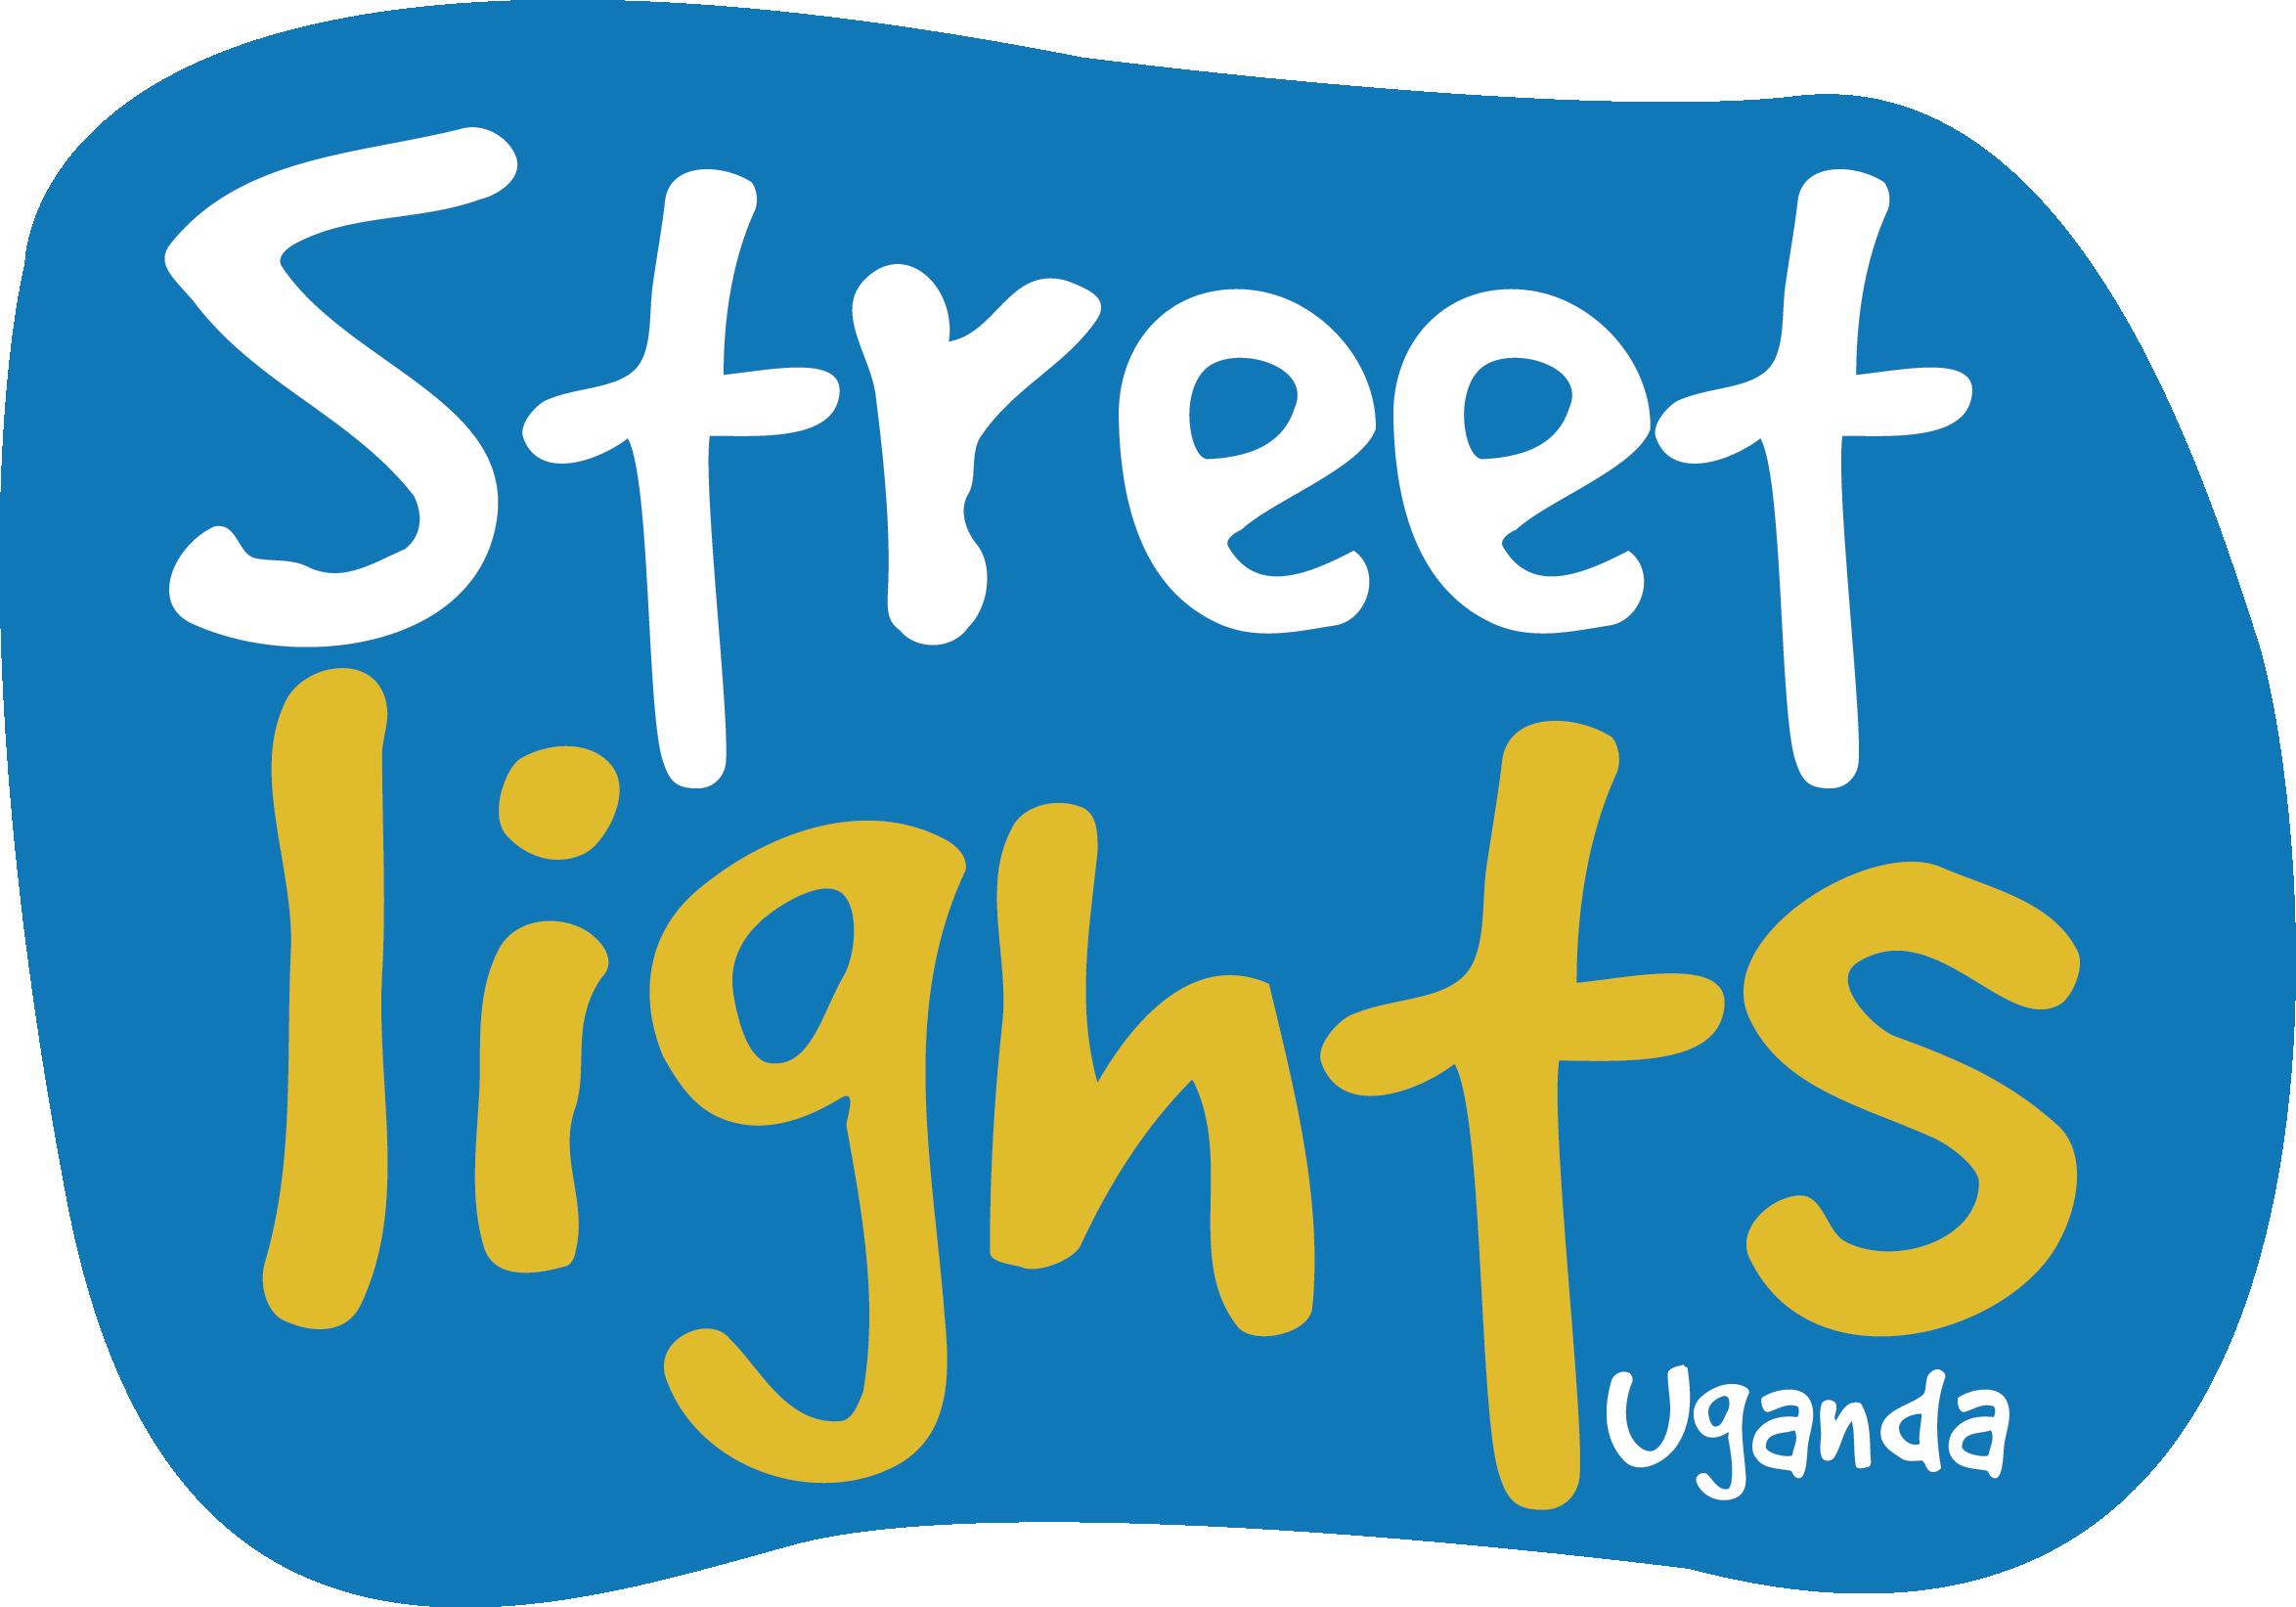 Streetlights Uganda